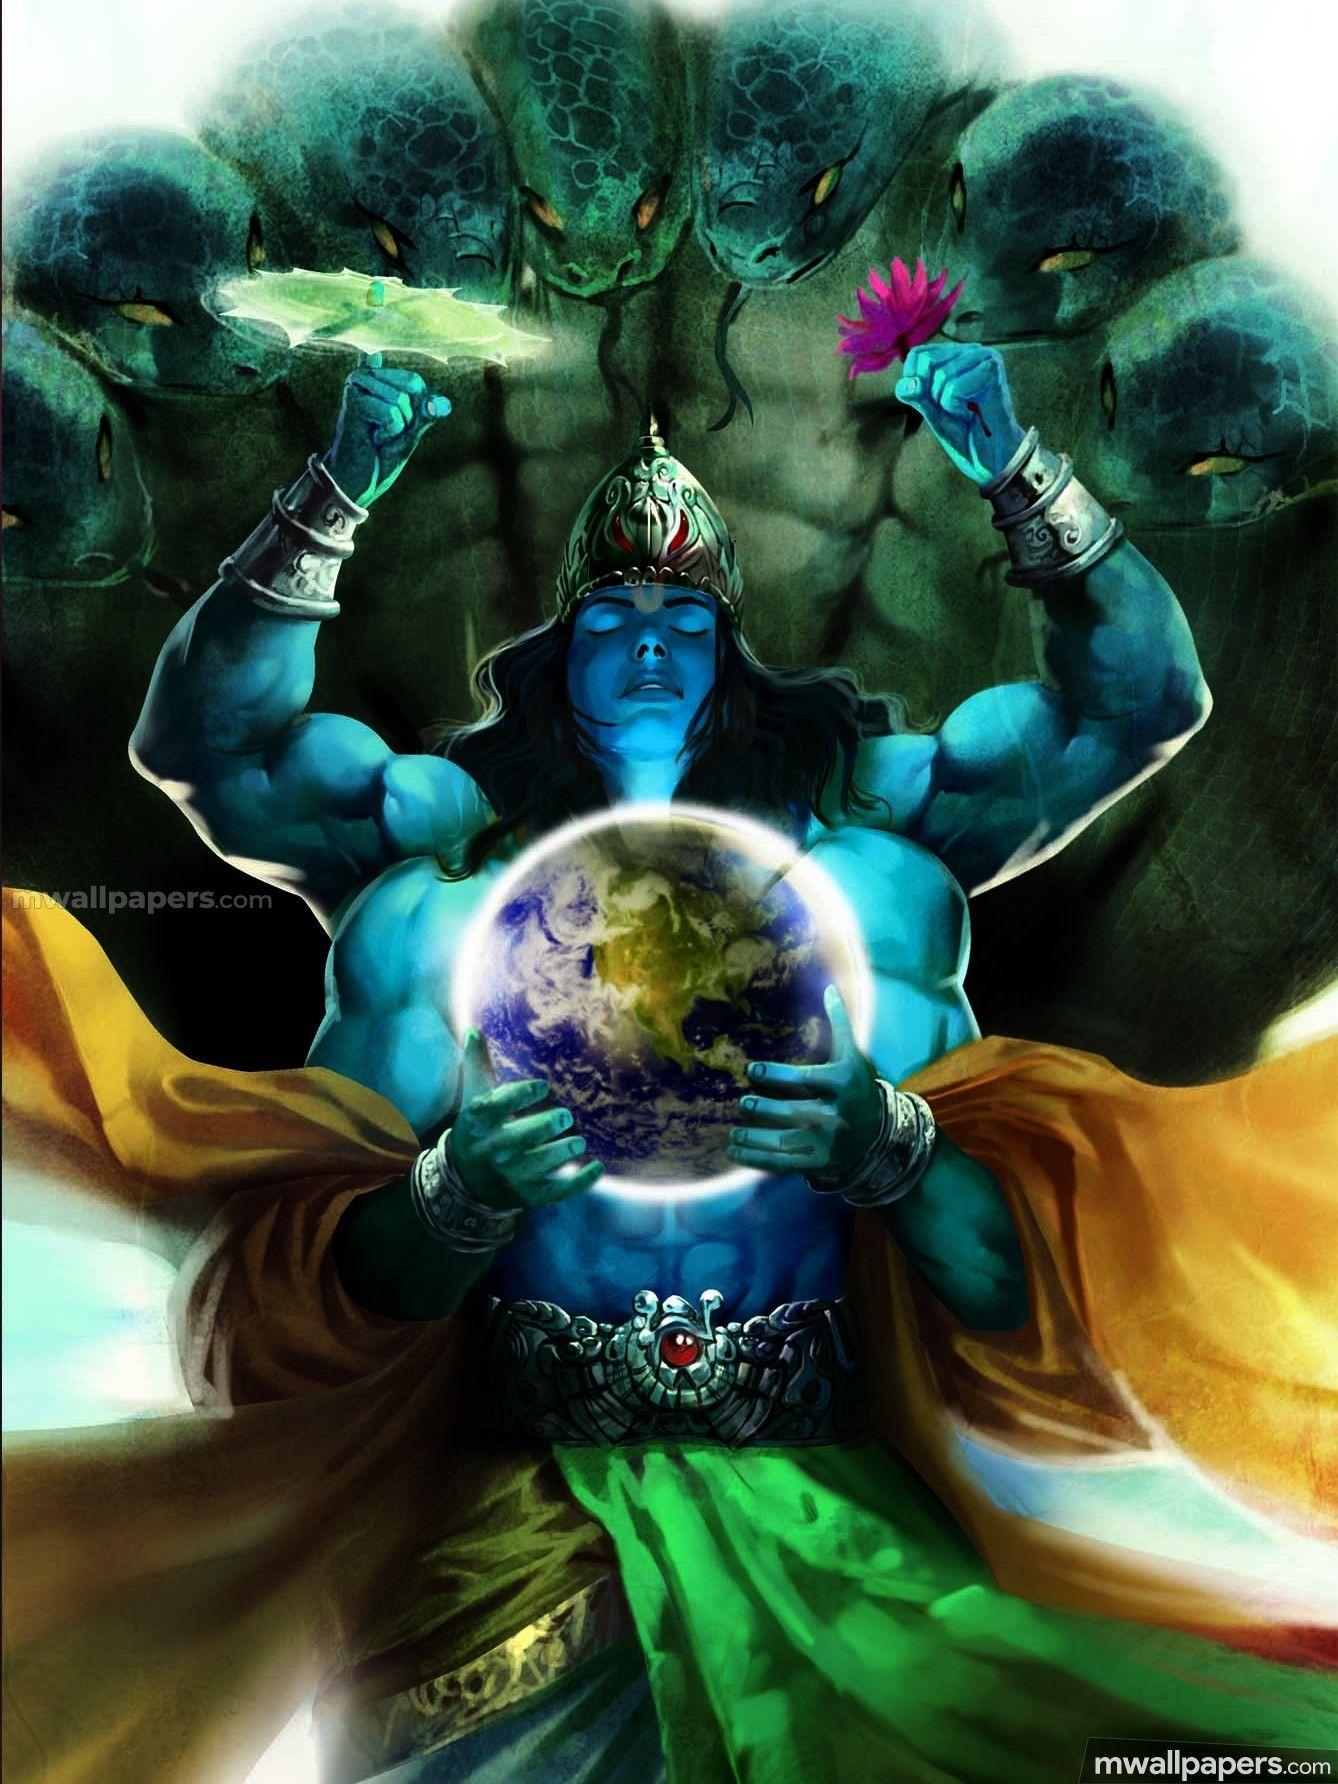 Lord Vishnu Hd Images 1080p 17197 Lordvishnu God Hindu Hdimages Hdwallpapers Lord Vishnu Wallpapers Lord Krishna Hd Wallpaper Lord Krishna Wallpapers